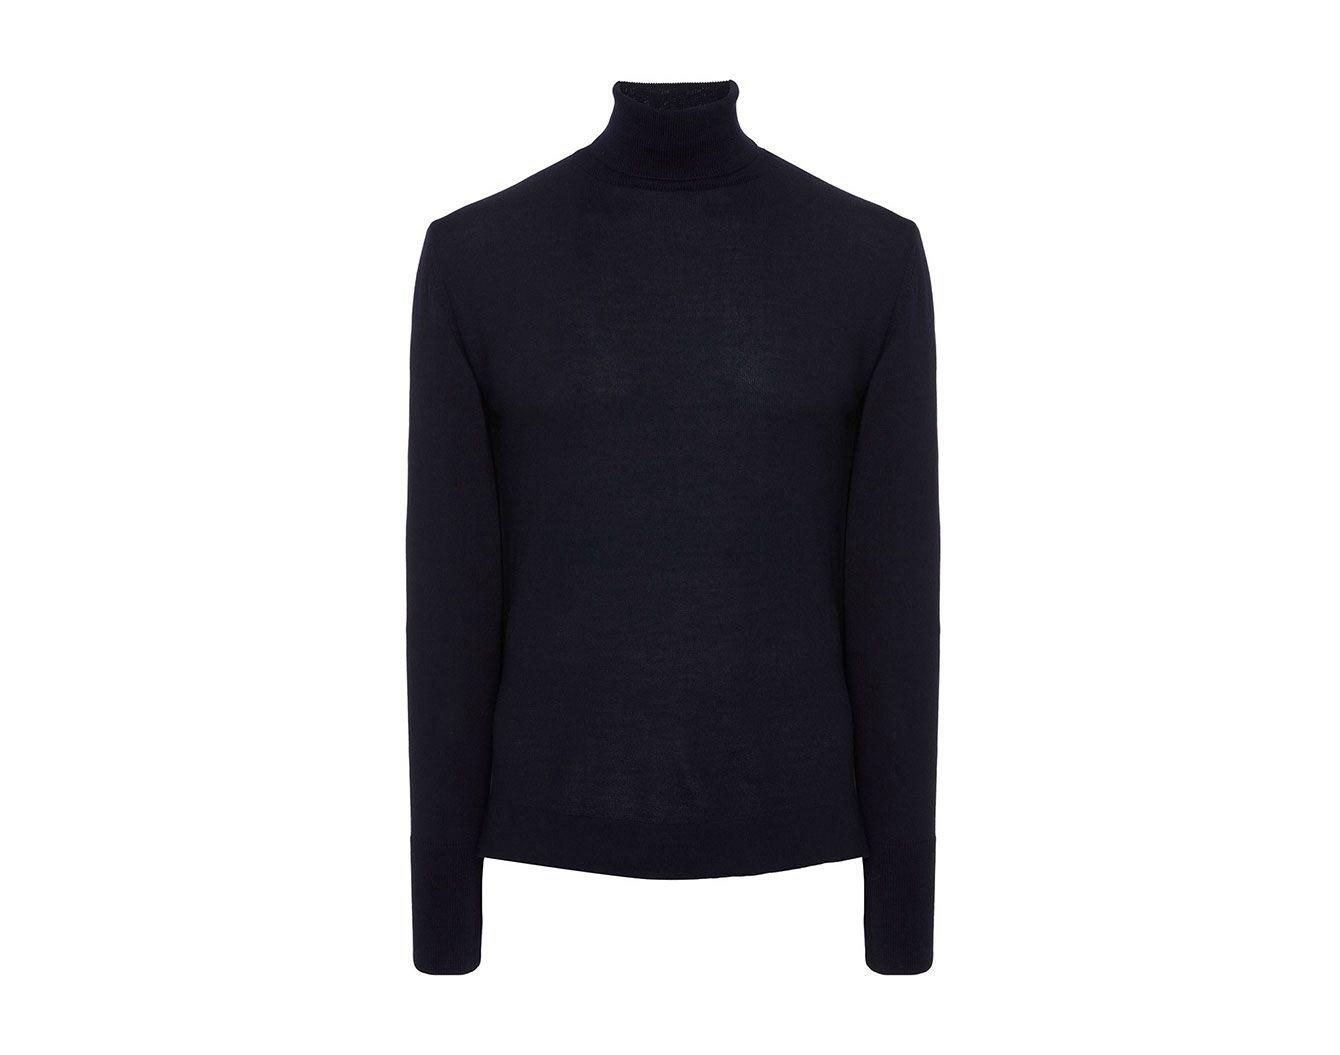 Officine Générale Merino Wool Turtleneck Sweater